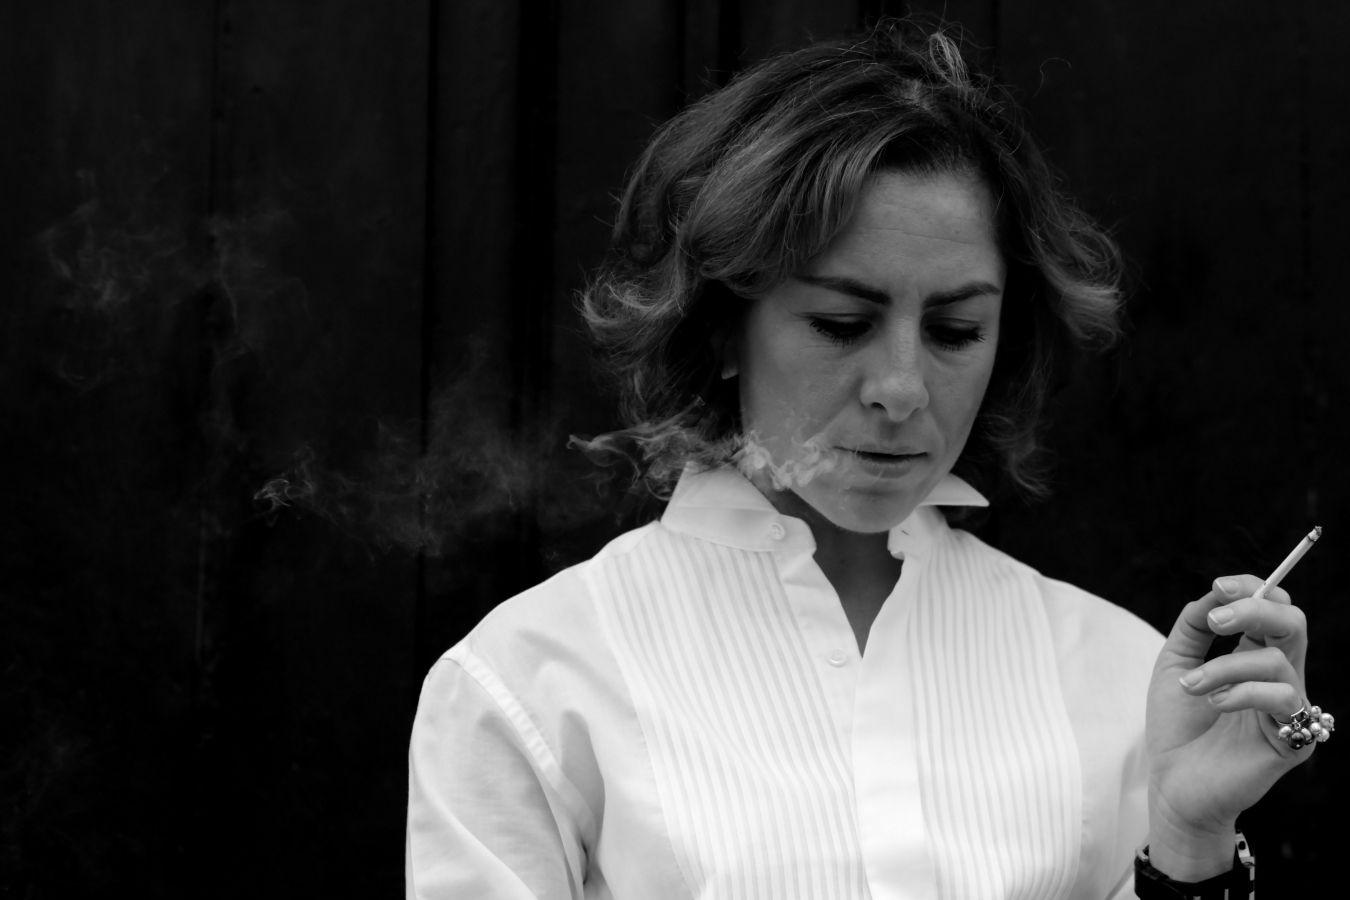 fashion-photography-The-Italian-Glam-italian-blogger-diaries #fashionphotography #TheItalianGlamdiaries #smoking #italianstyle